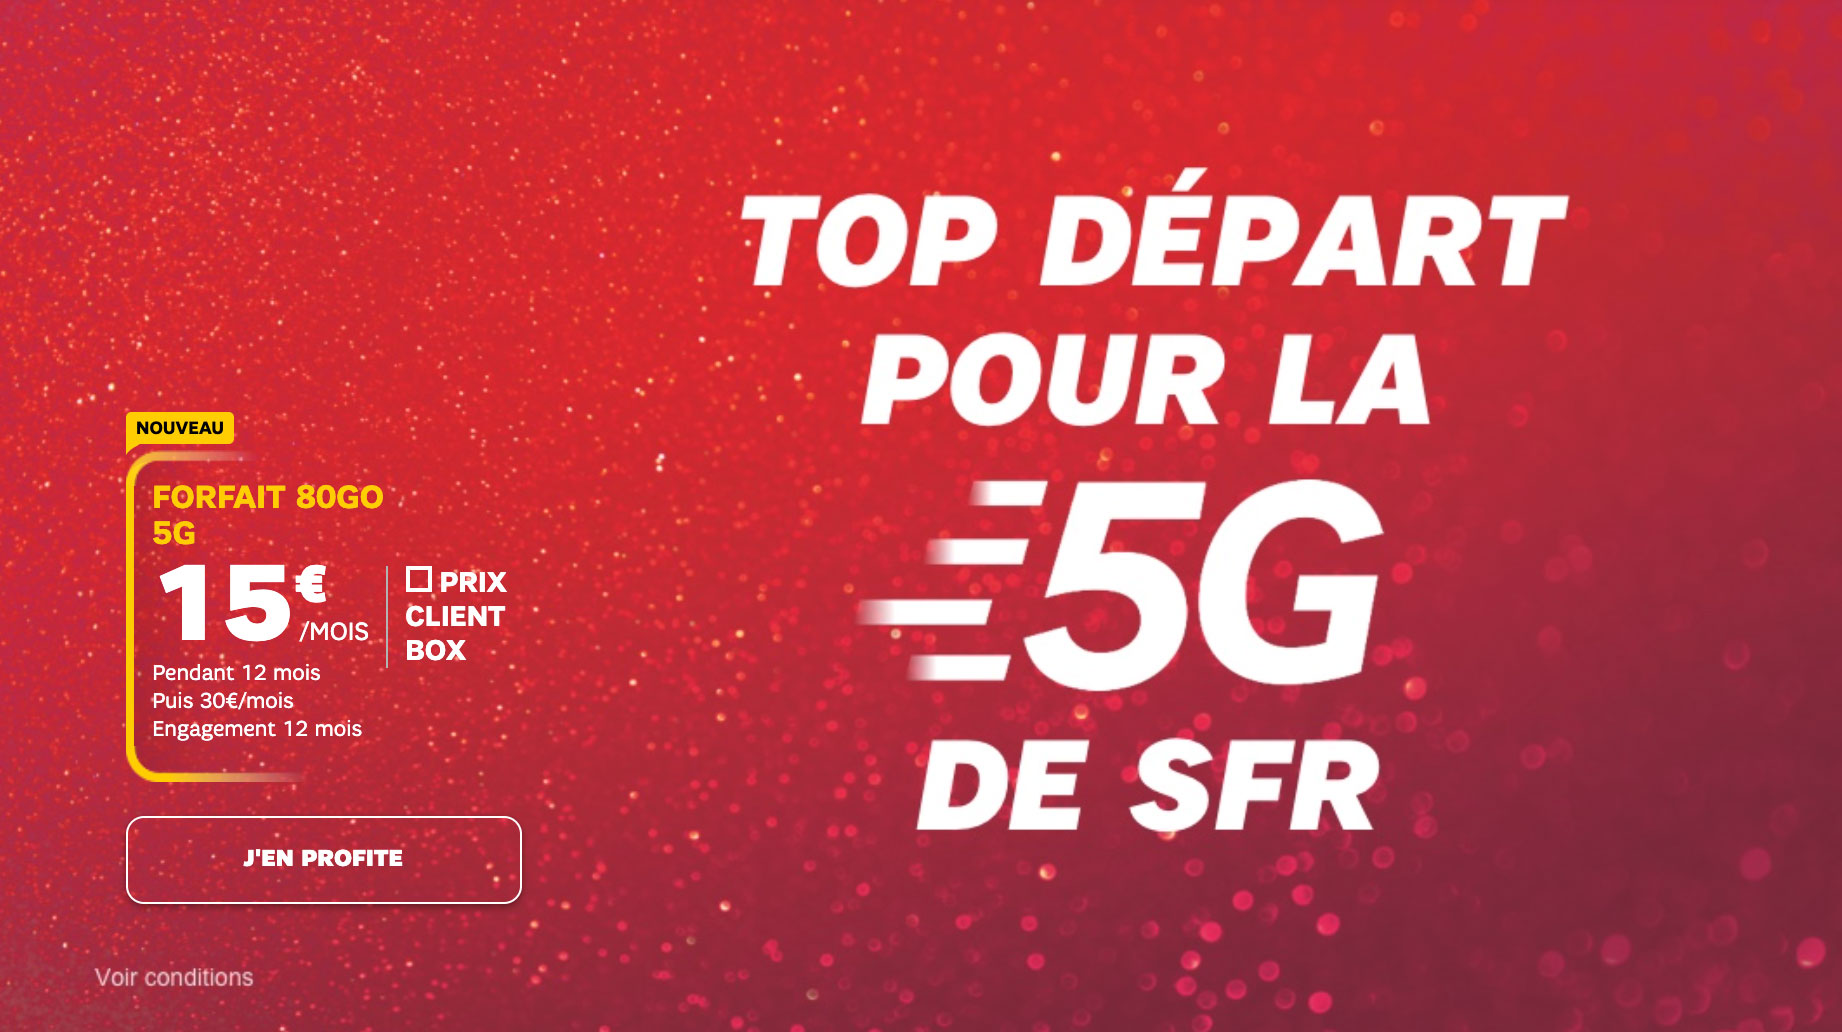 Forfait 5G